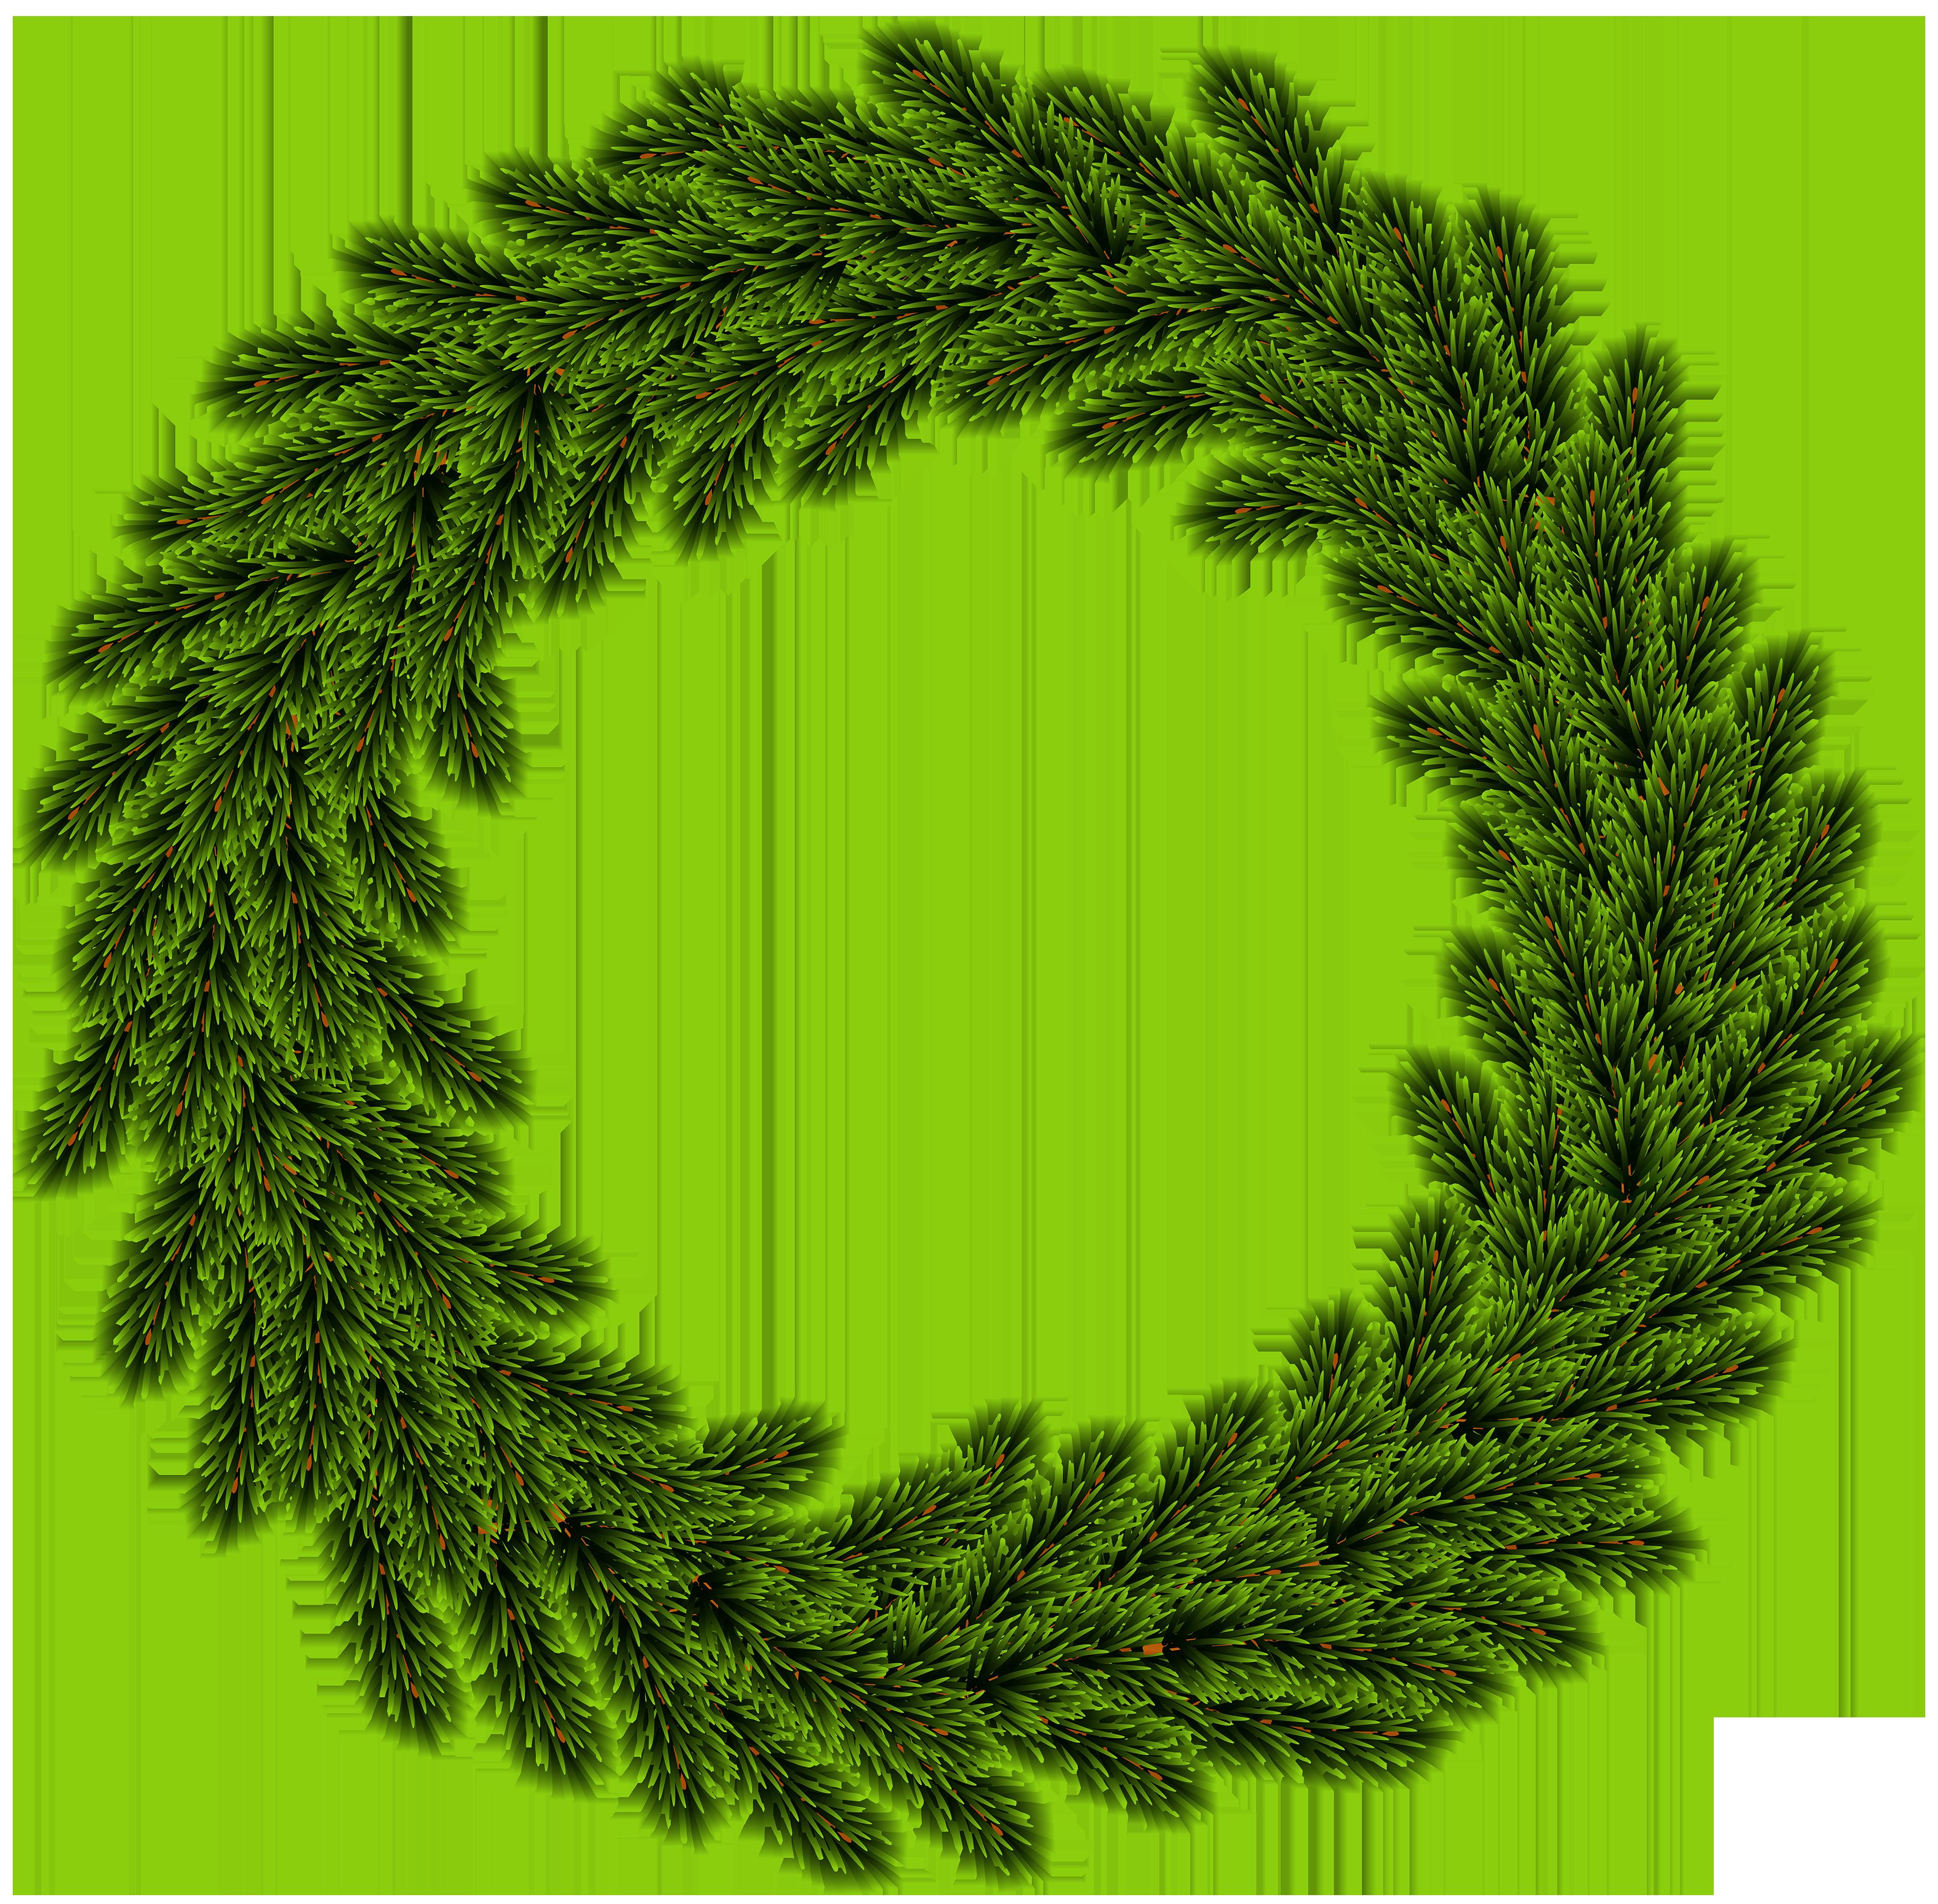 Pine Wreath Clip Art Image.